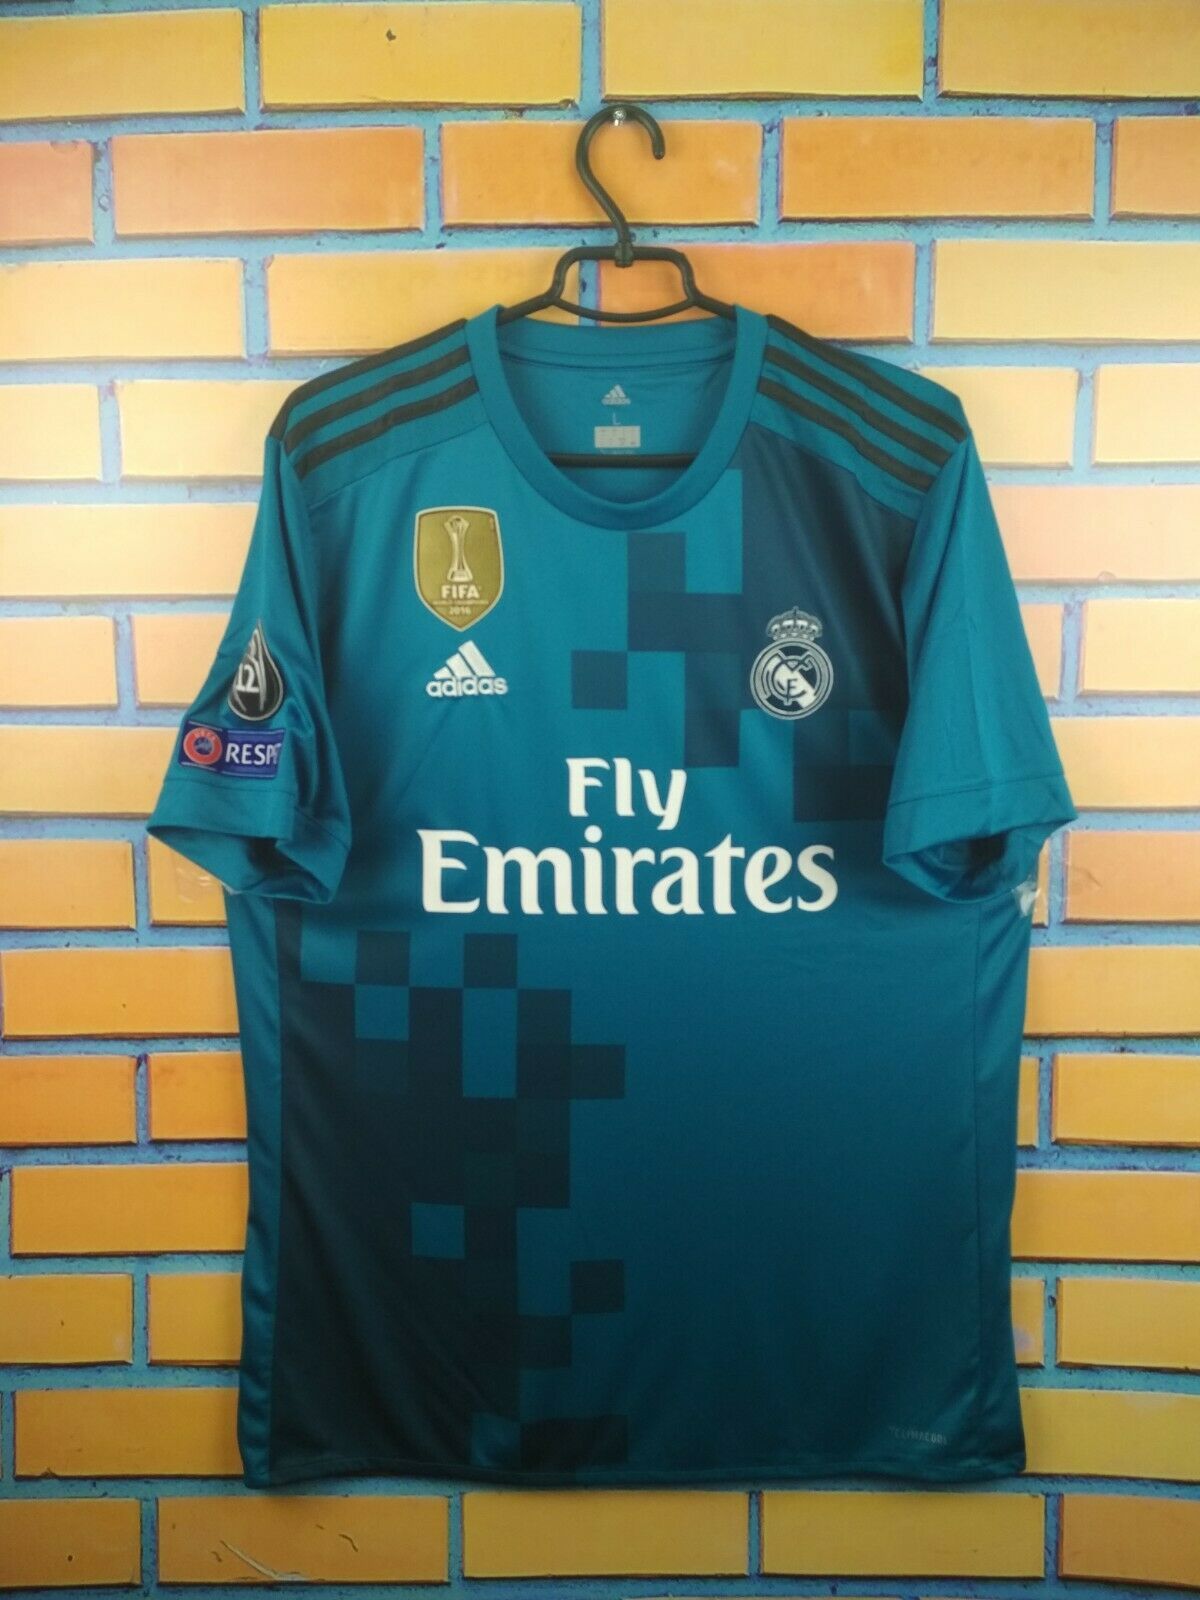 Real Madrid third jersey gree 2019 shirt BR3539 soccer footbtutti Adidas